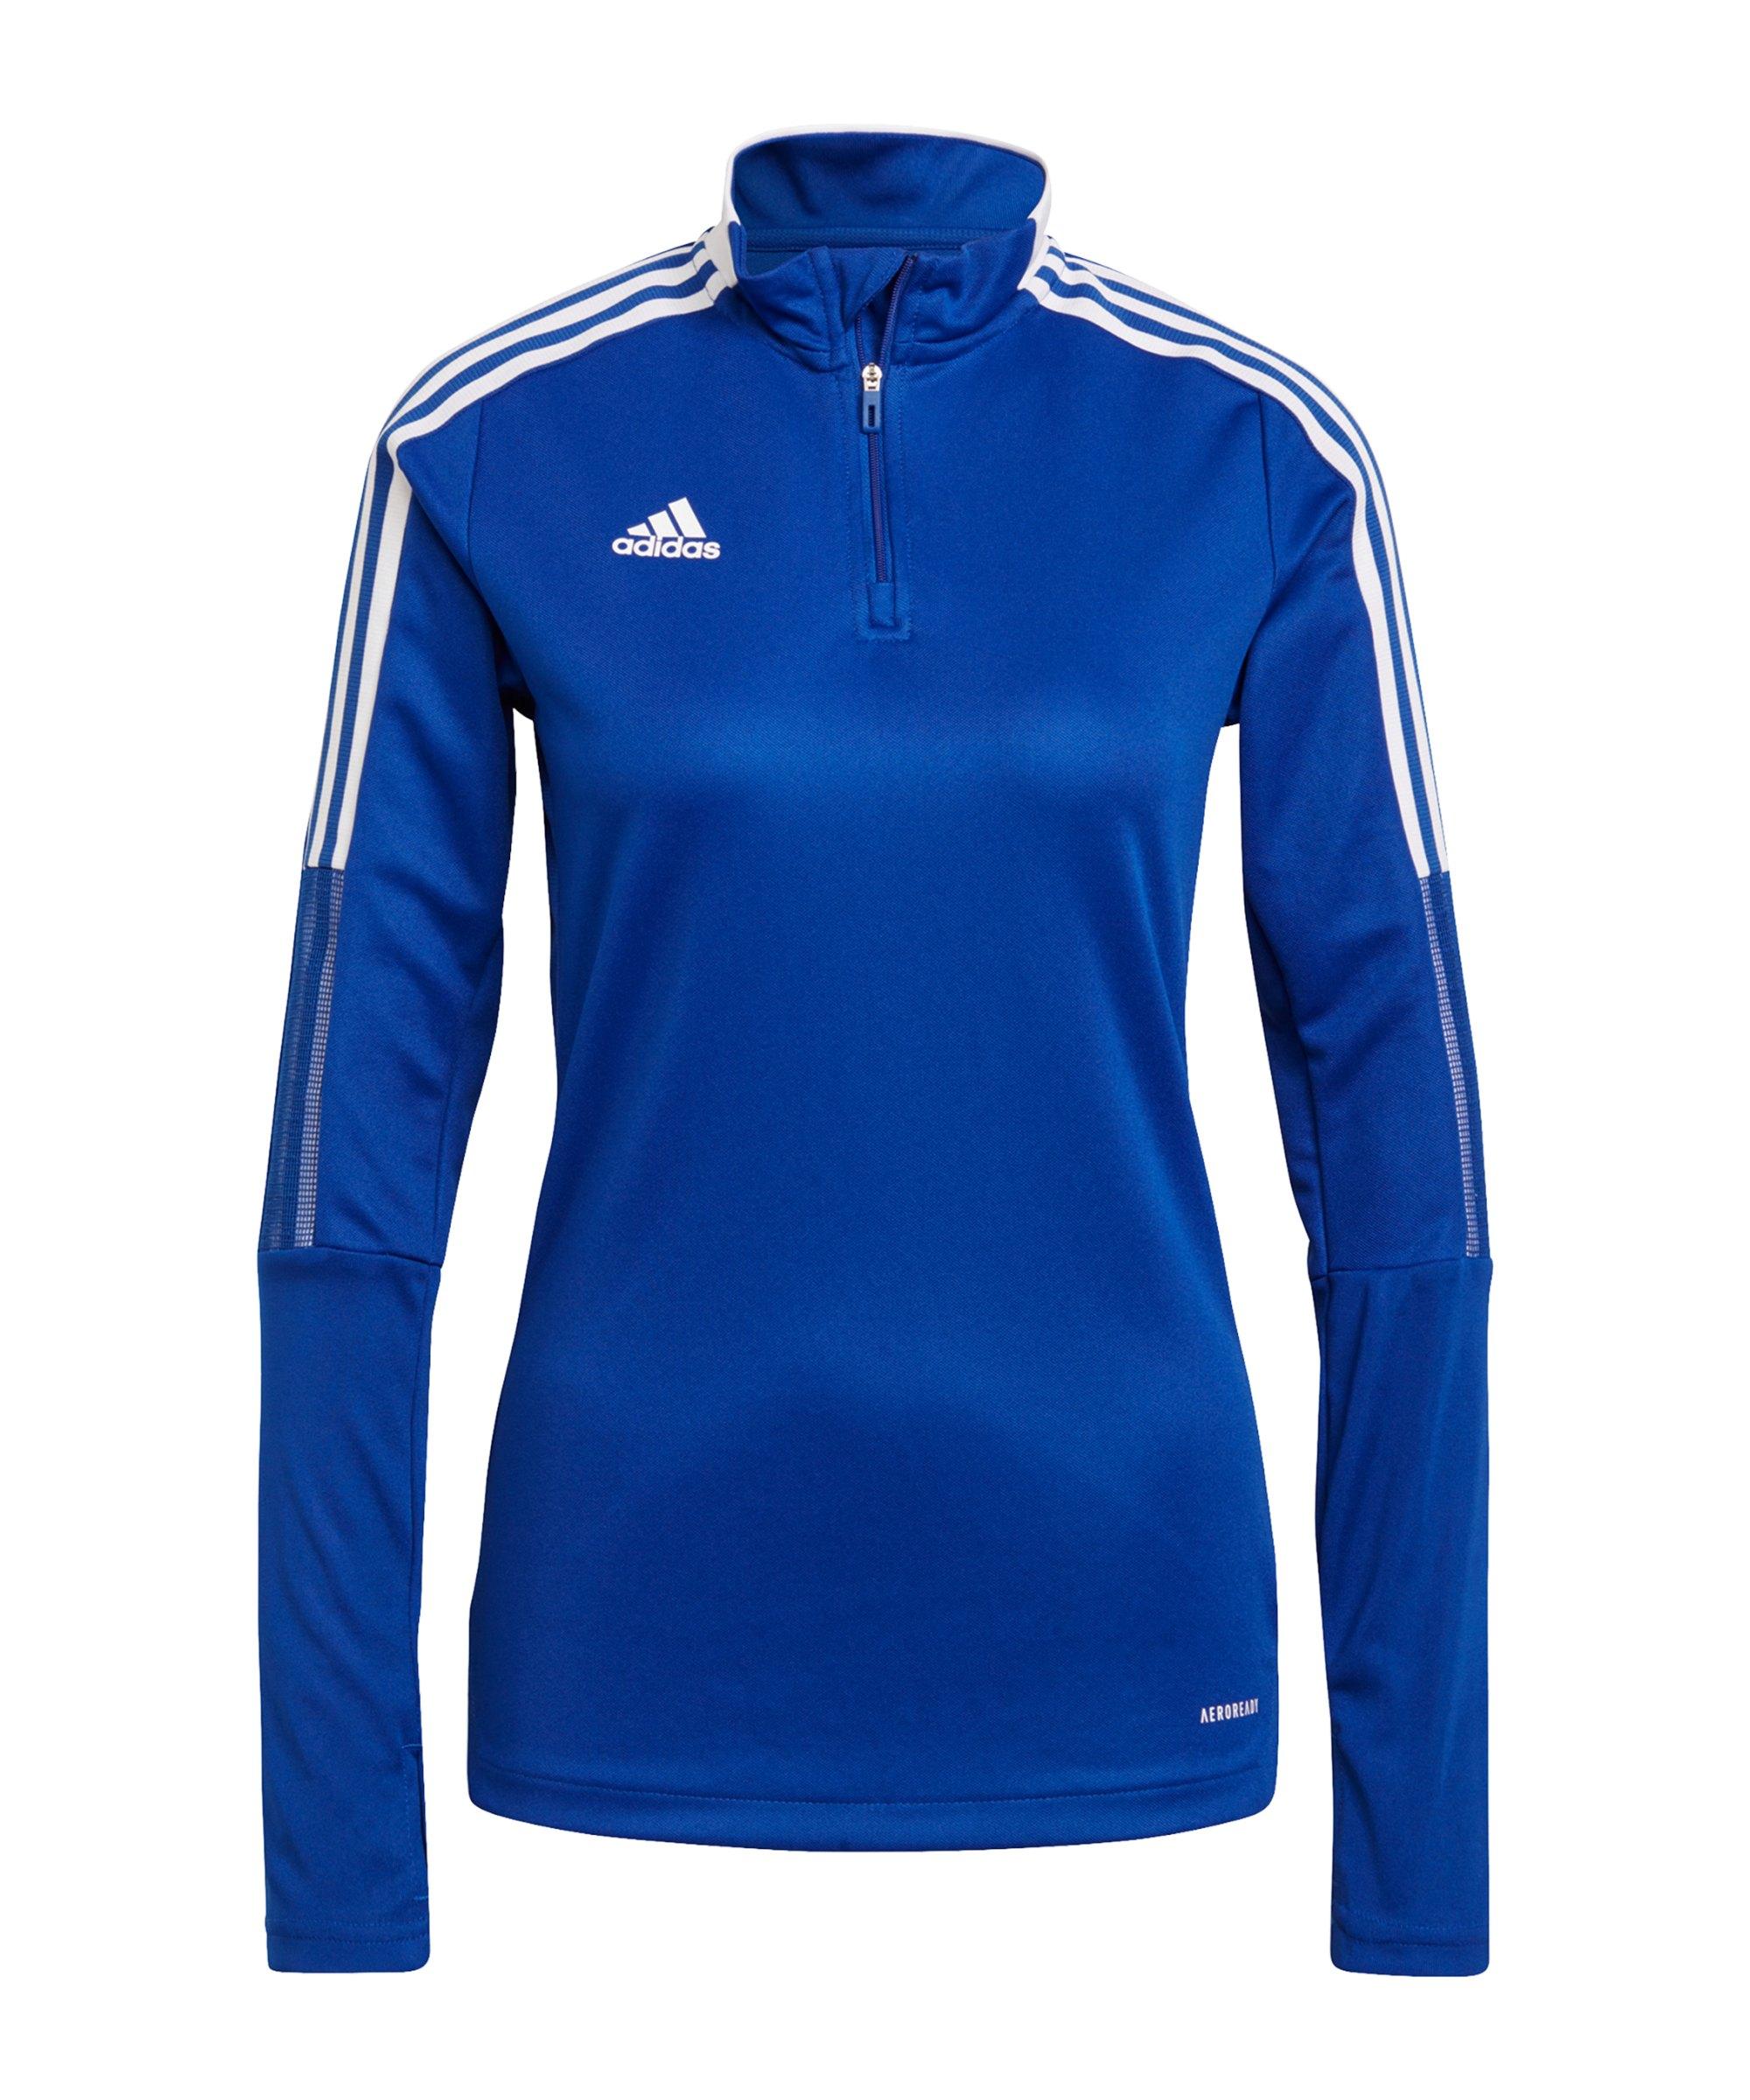 adidas Tiro 21 Trainingstop Damen Blau - blau